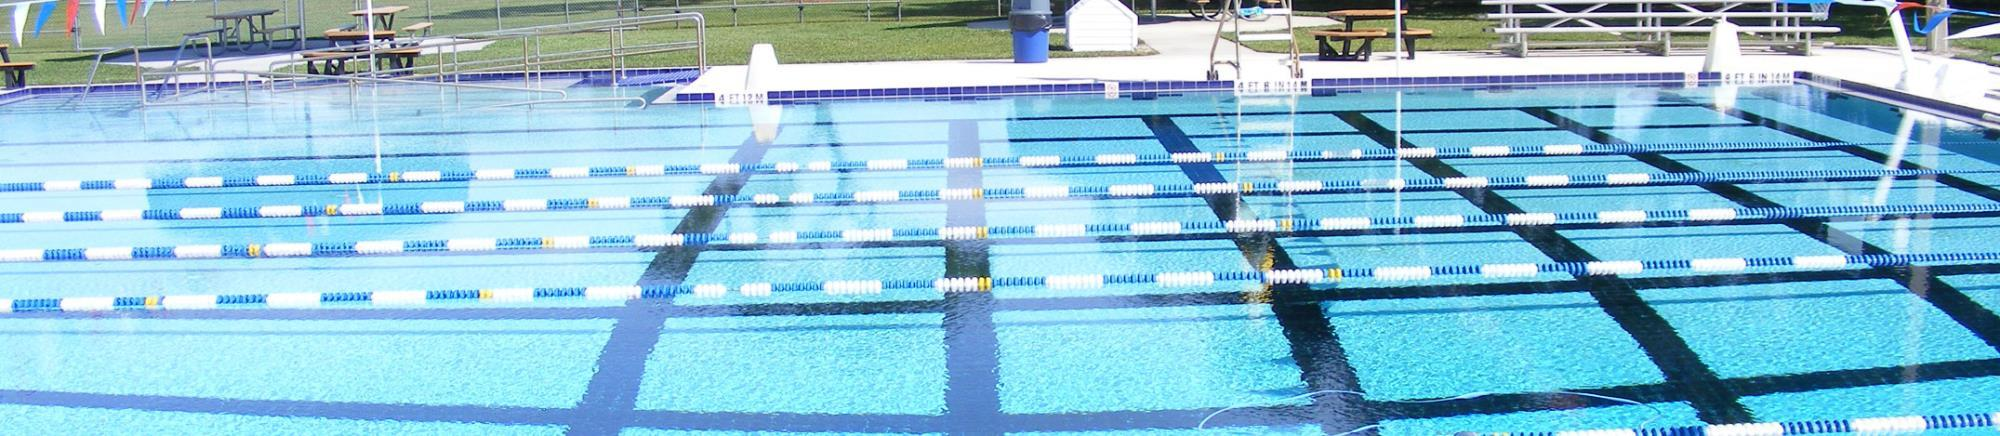 Highlander Pool Open Swim